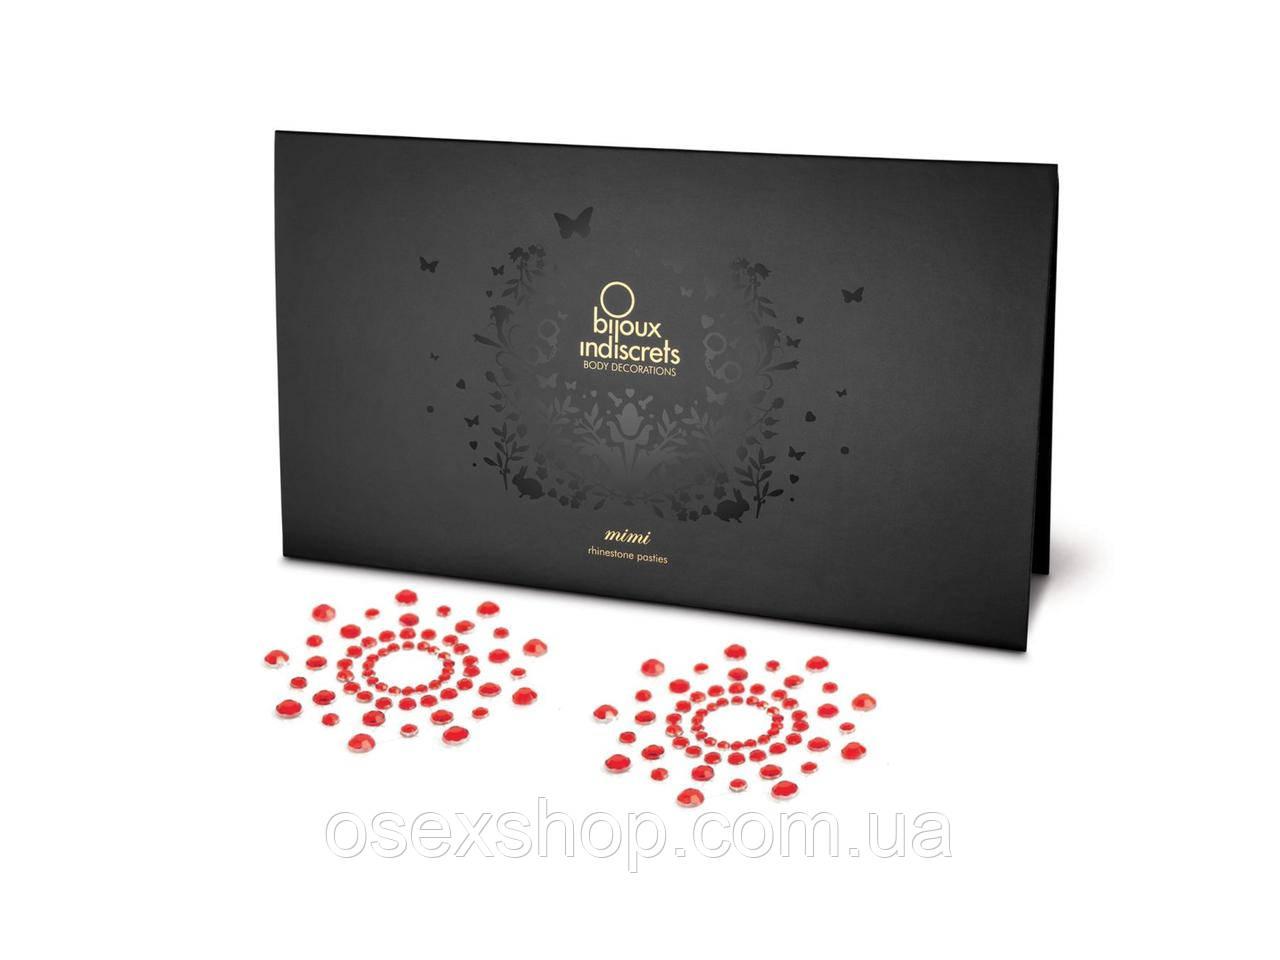 Пэстис из кристаллов Bijoux Indiscrets - Mimi Red, украшение на грудь